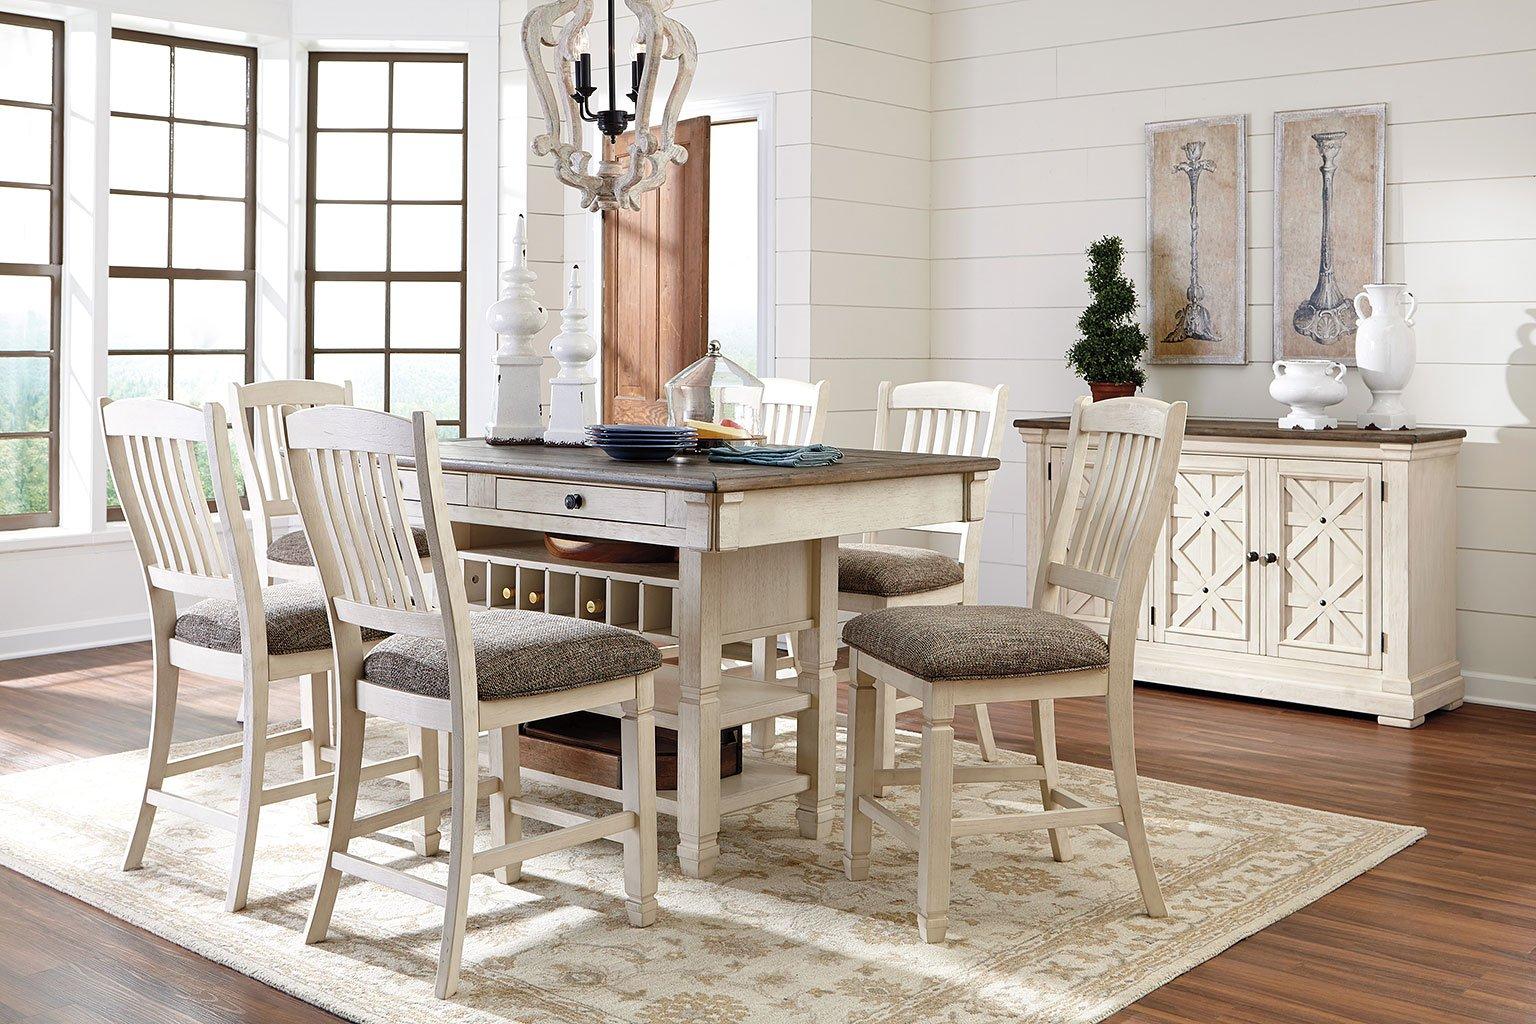 bolanburg counter height dining setsignature design